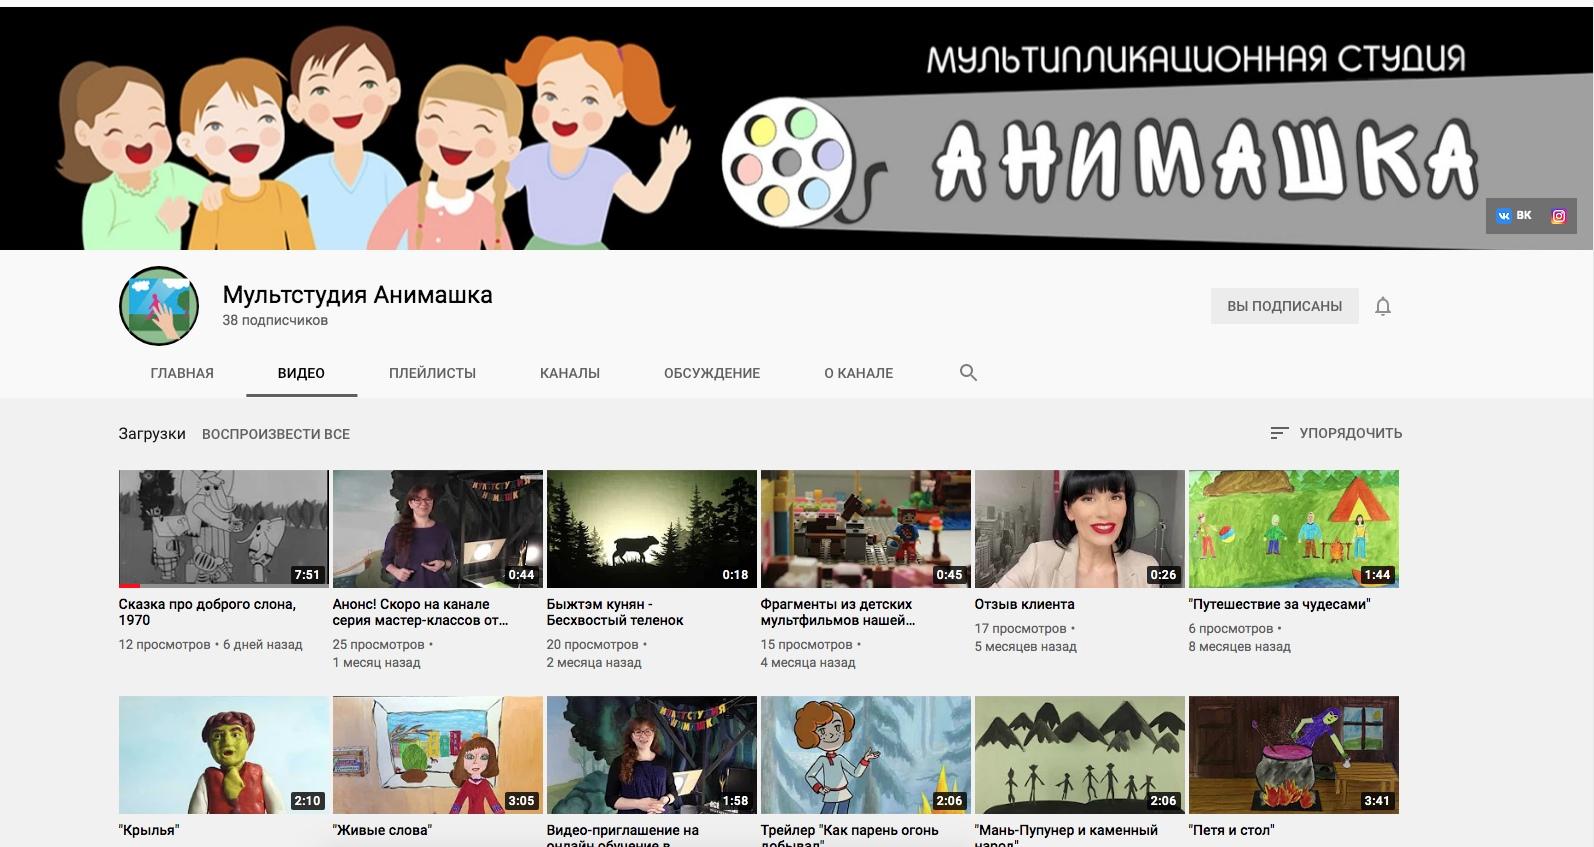 Подписывайтесь на наш You-Tube канал!